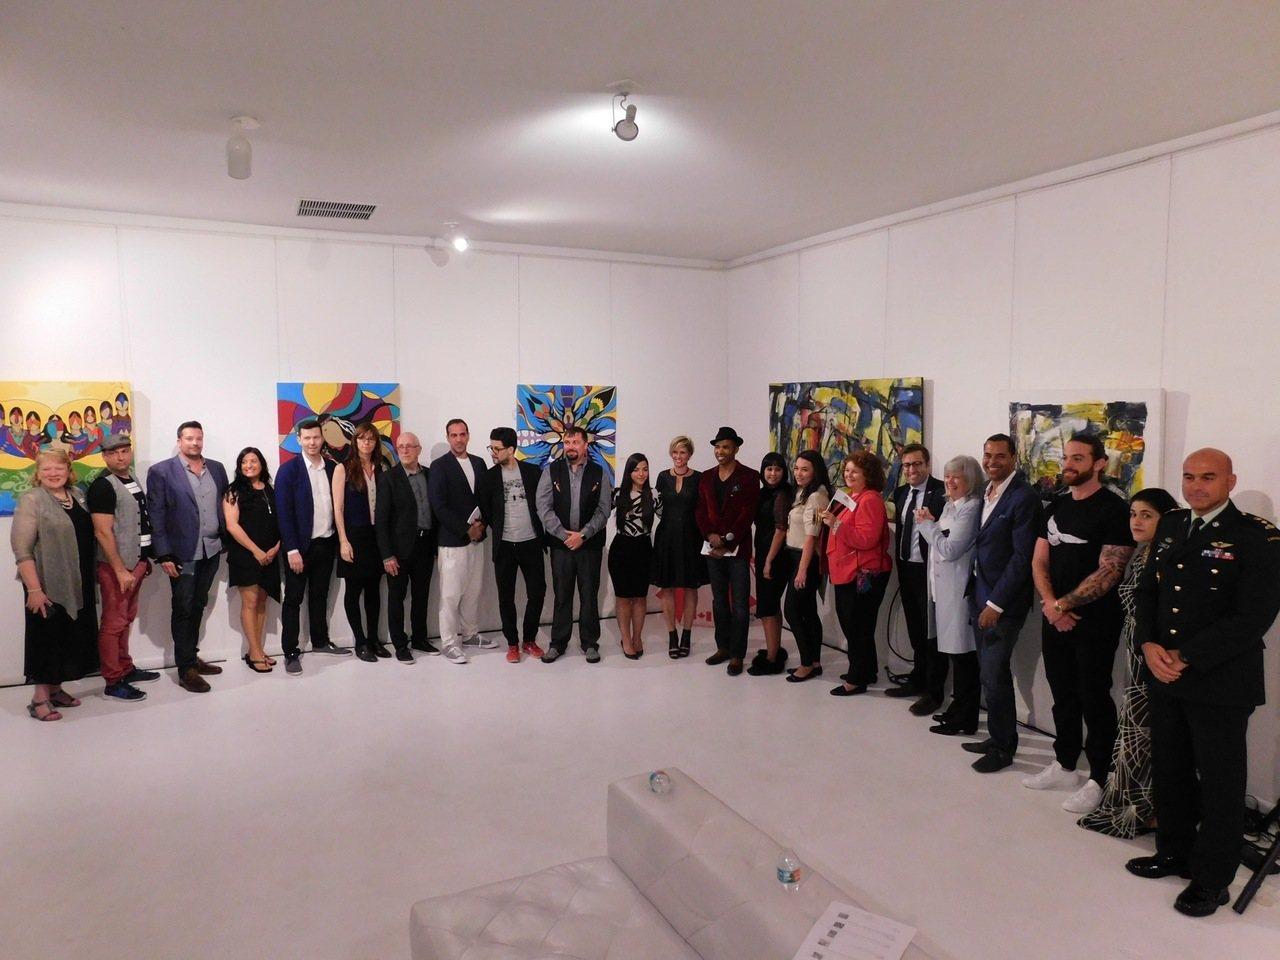 Canada 150 artistes miami wynwood 8472 le courrier de for Chambre de commerce franco americaine